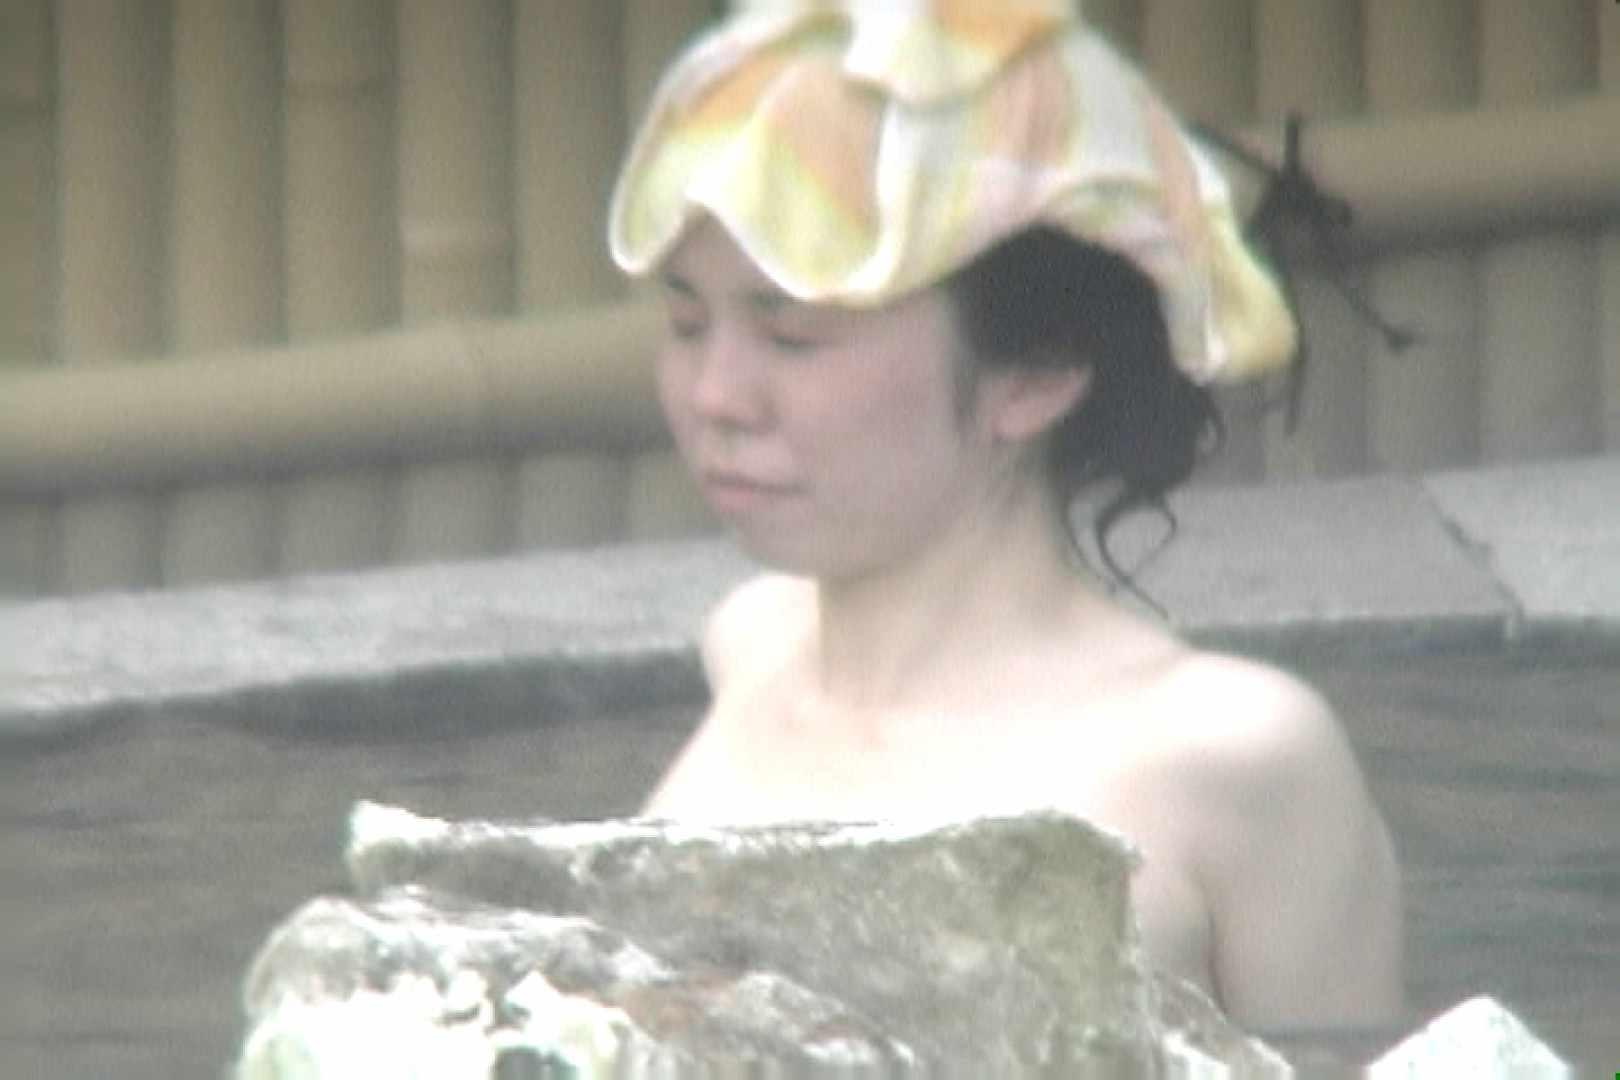 Aquaな露天風呂Vol.687 露天 隠し撮りオマンコ動画紹介 63画像 20